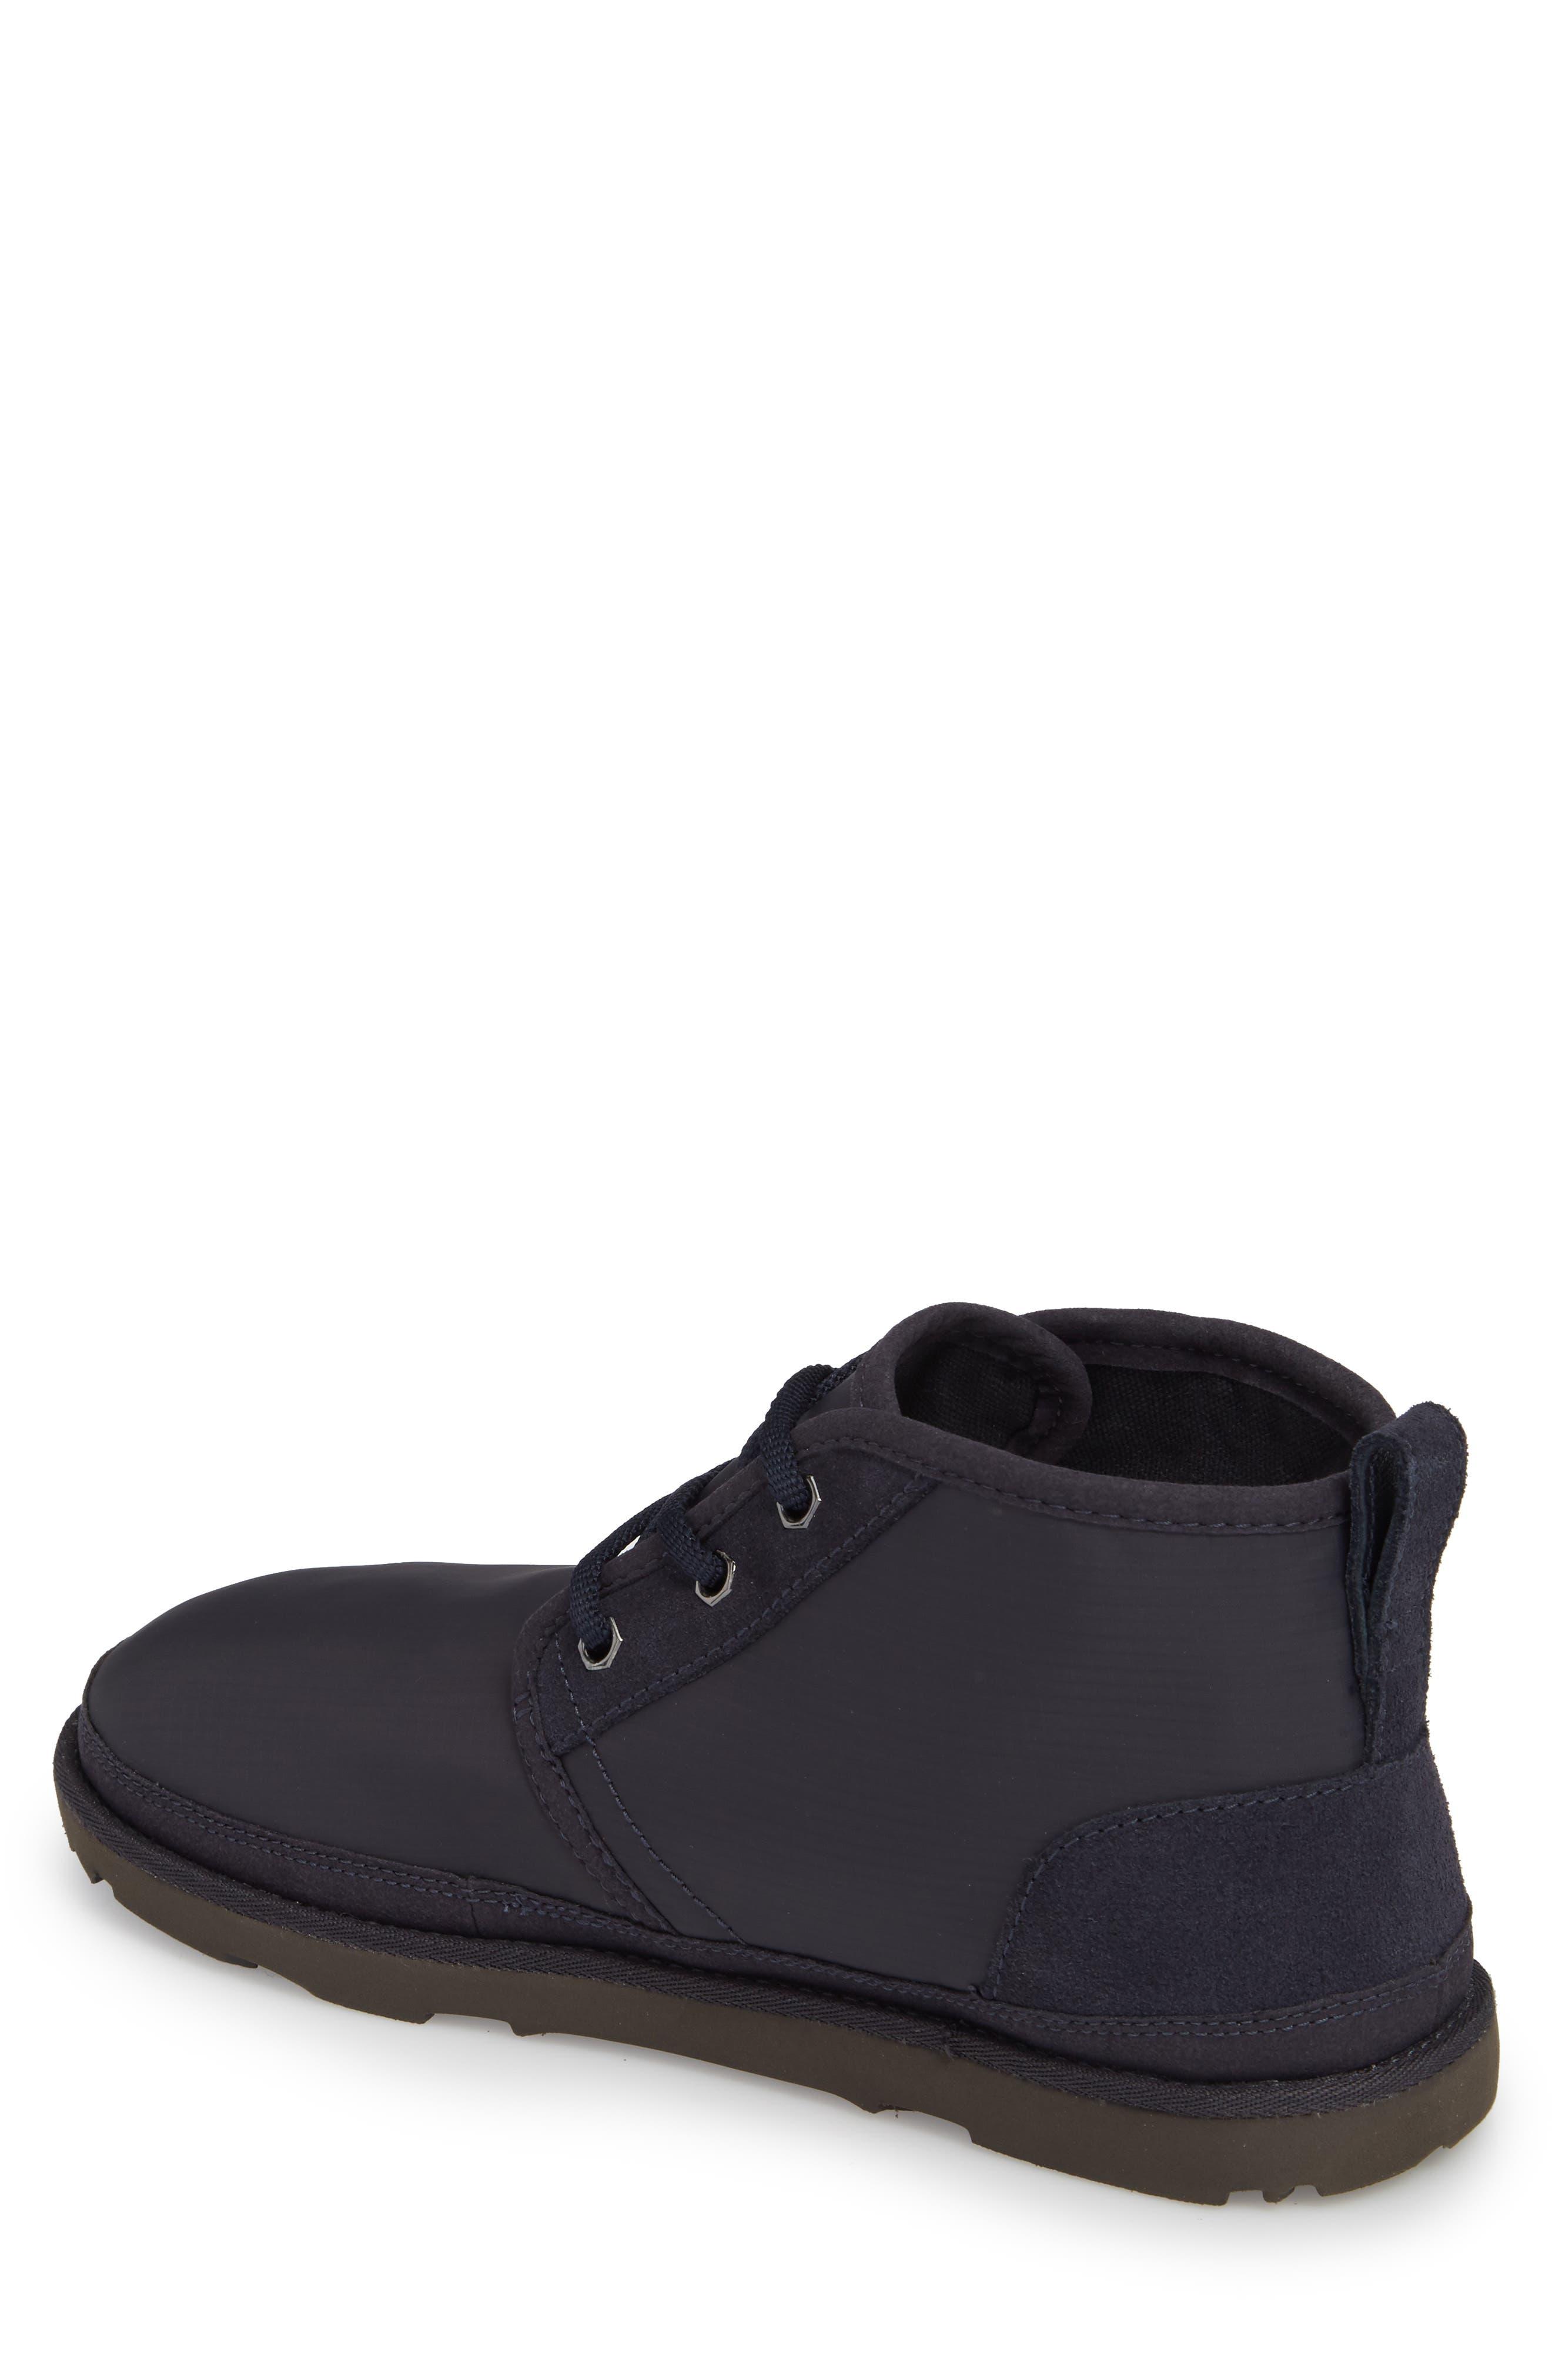 Neumel Ripstop Chukka Boot,                             Alternate thumbnail 2, color,                             True Navy Leather